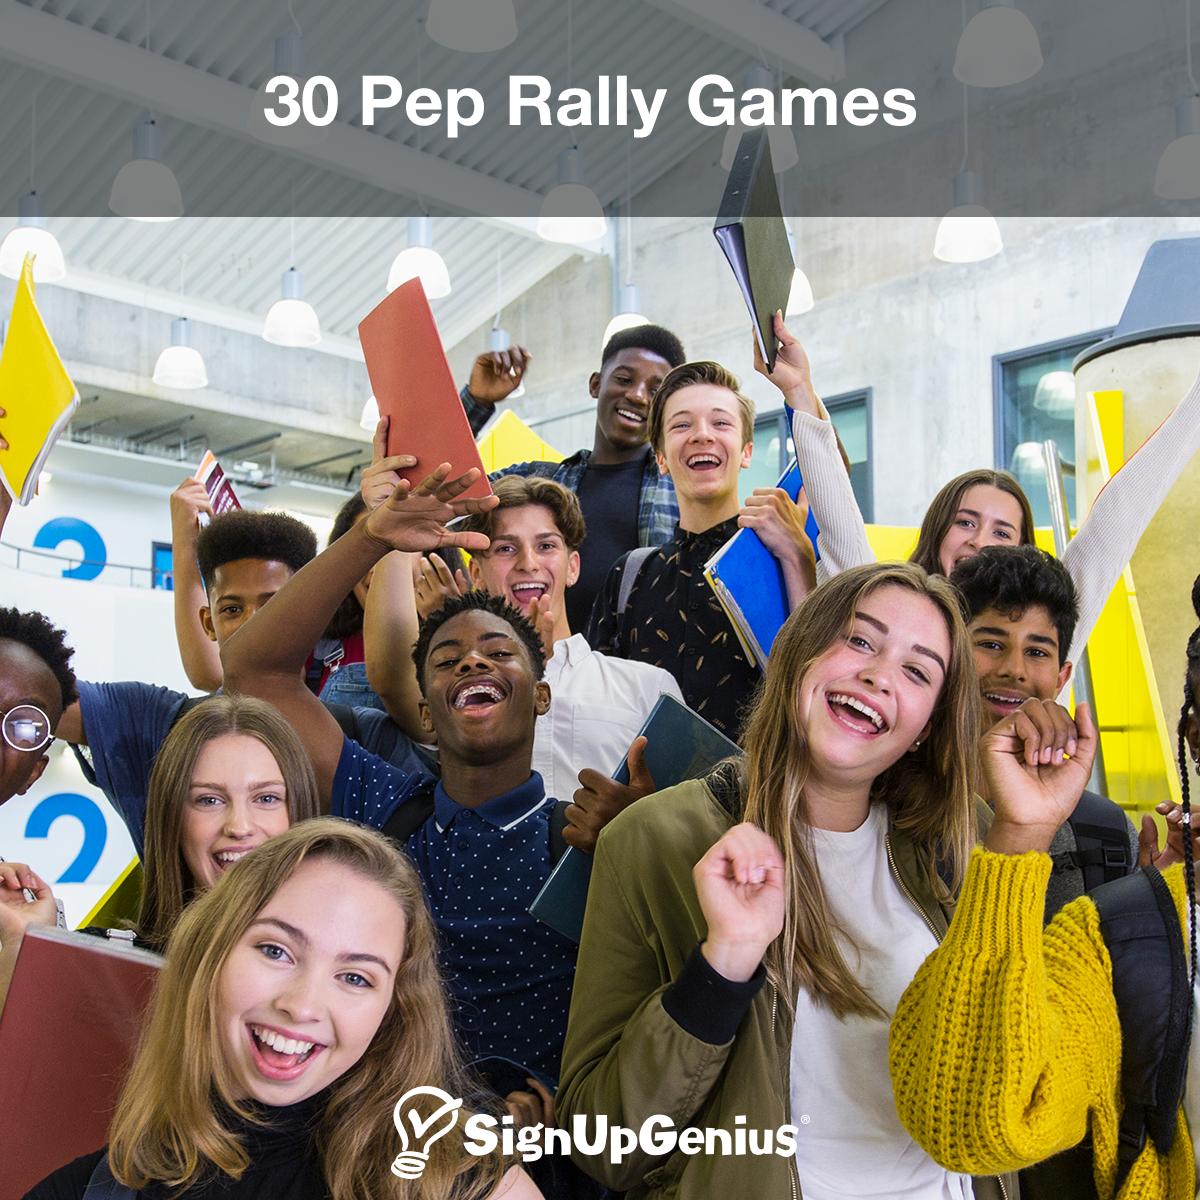 30 Pep Rally Games Pep rally games, Rally games, School